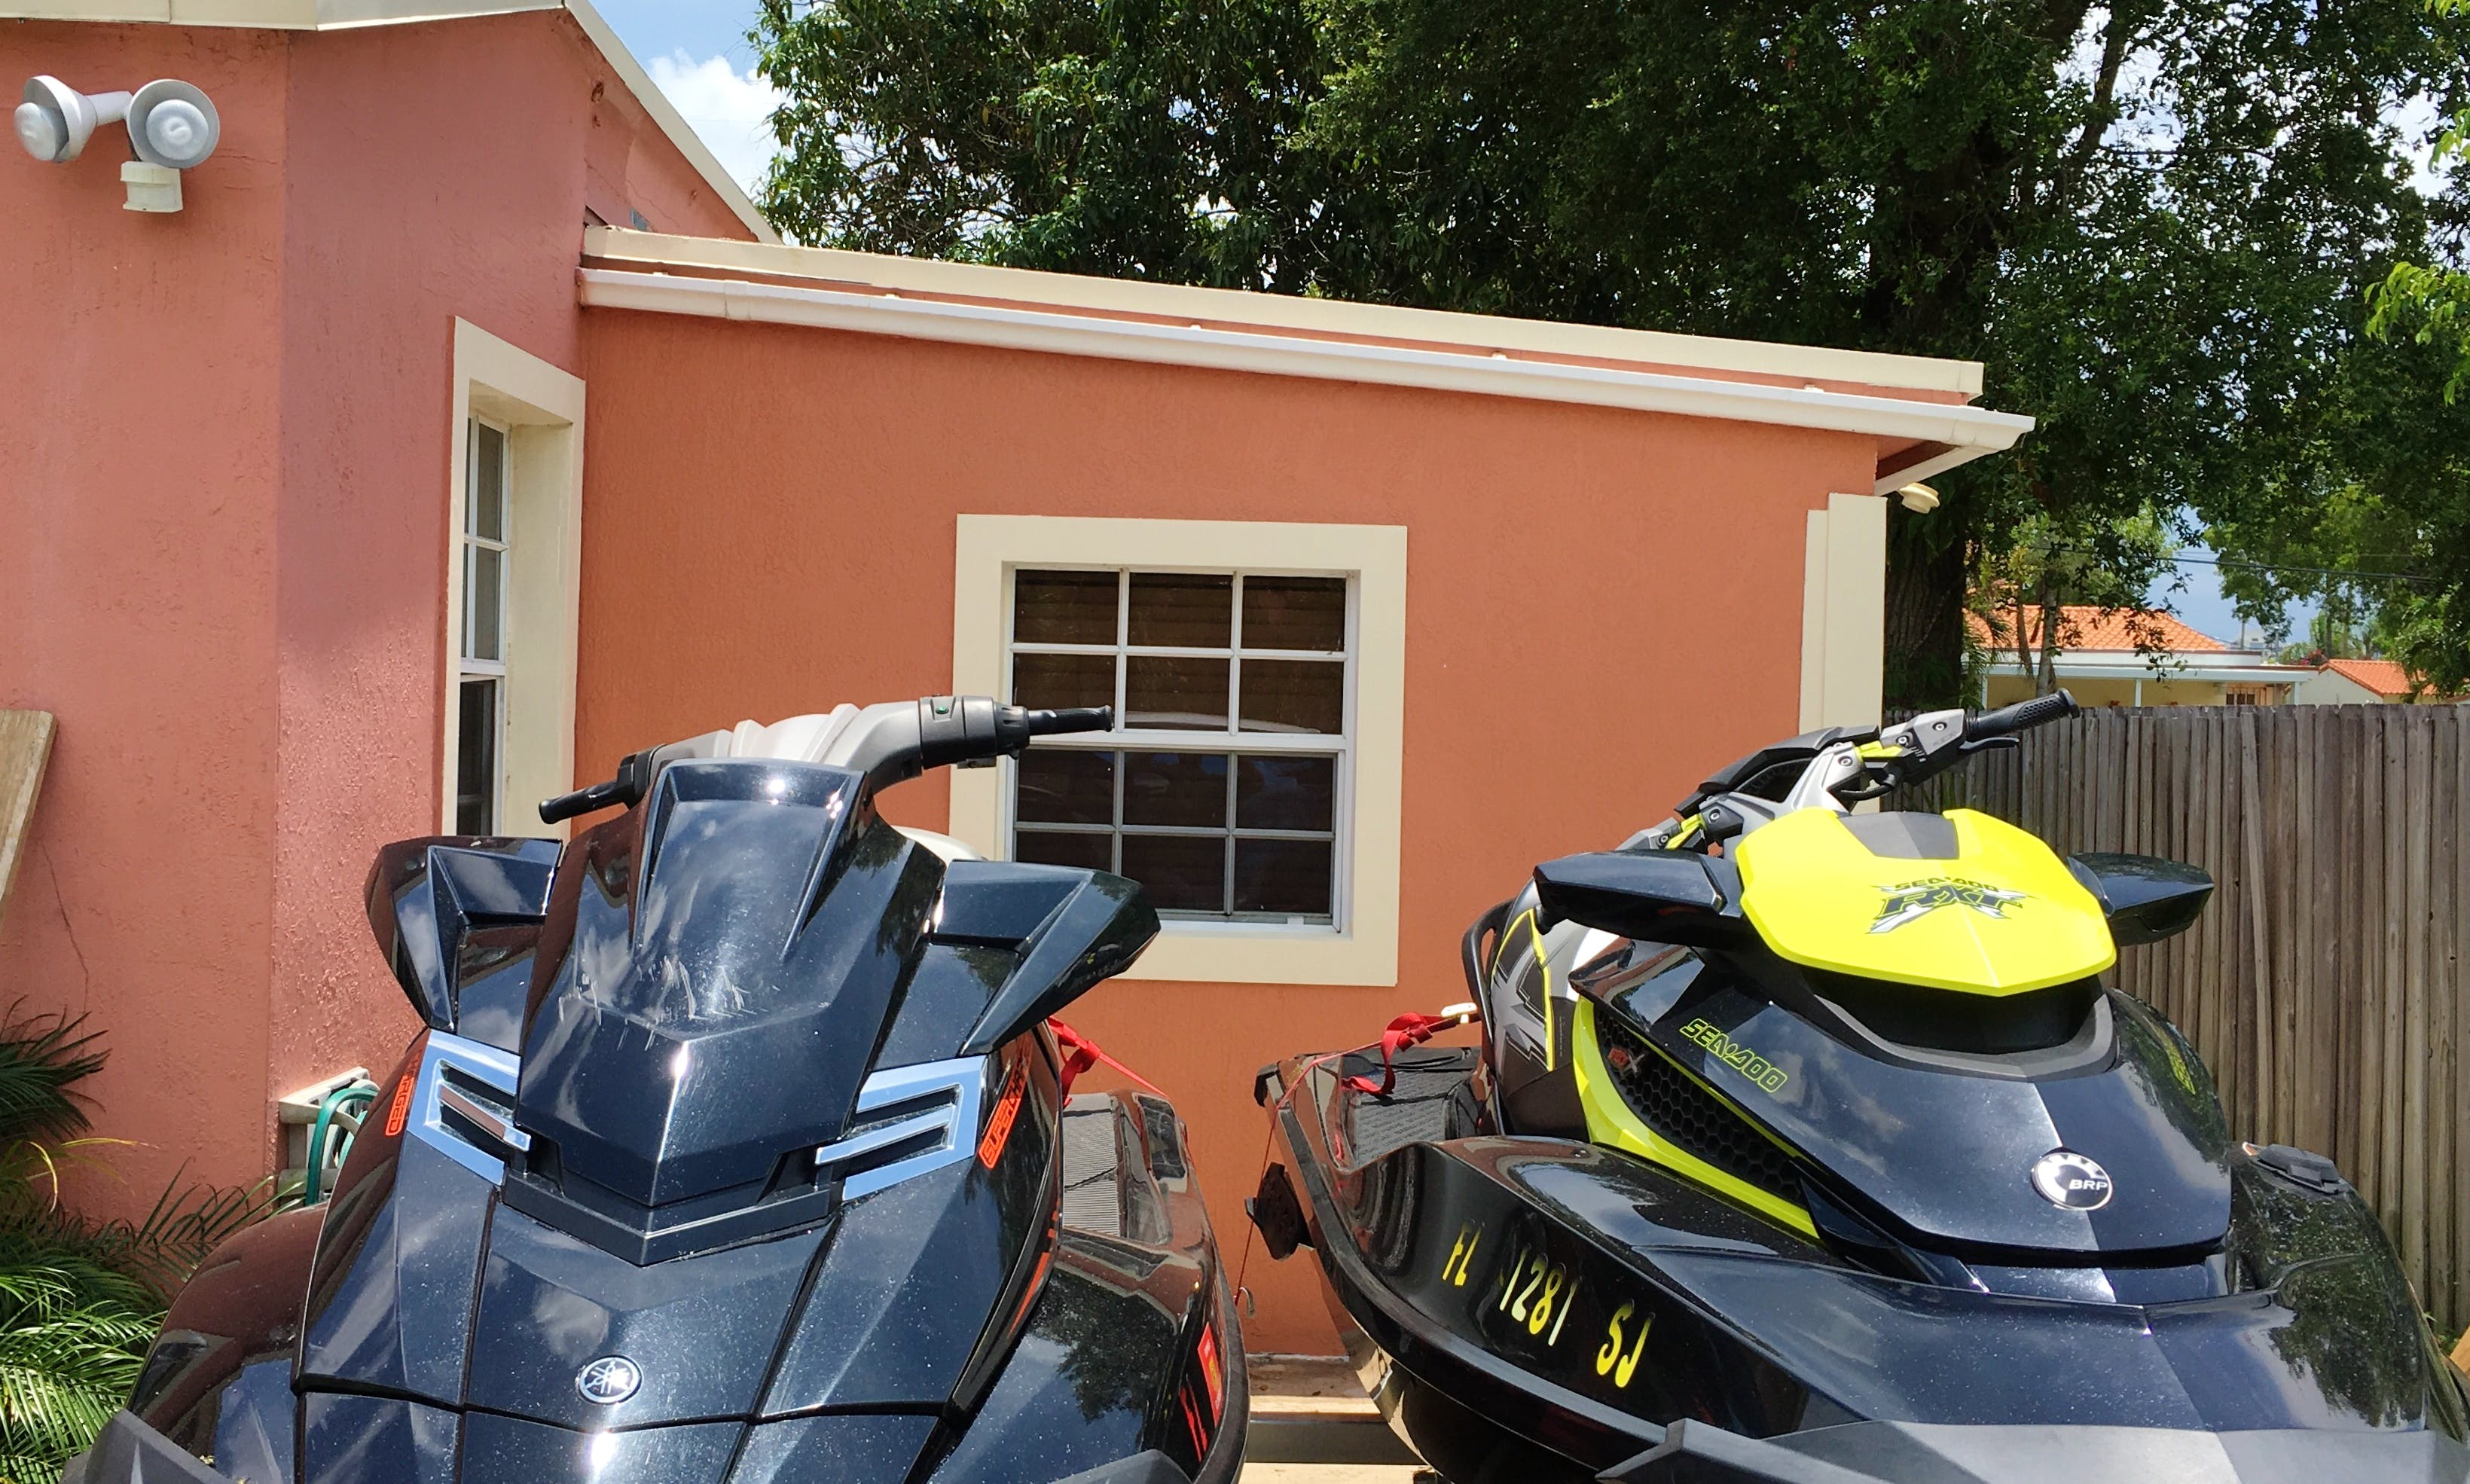 Jet Ski Rental and Tour in Key Biscayne